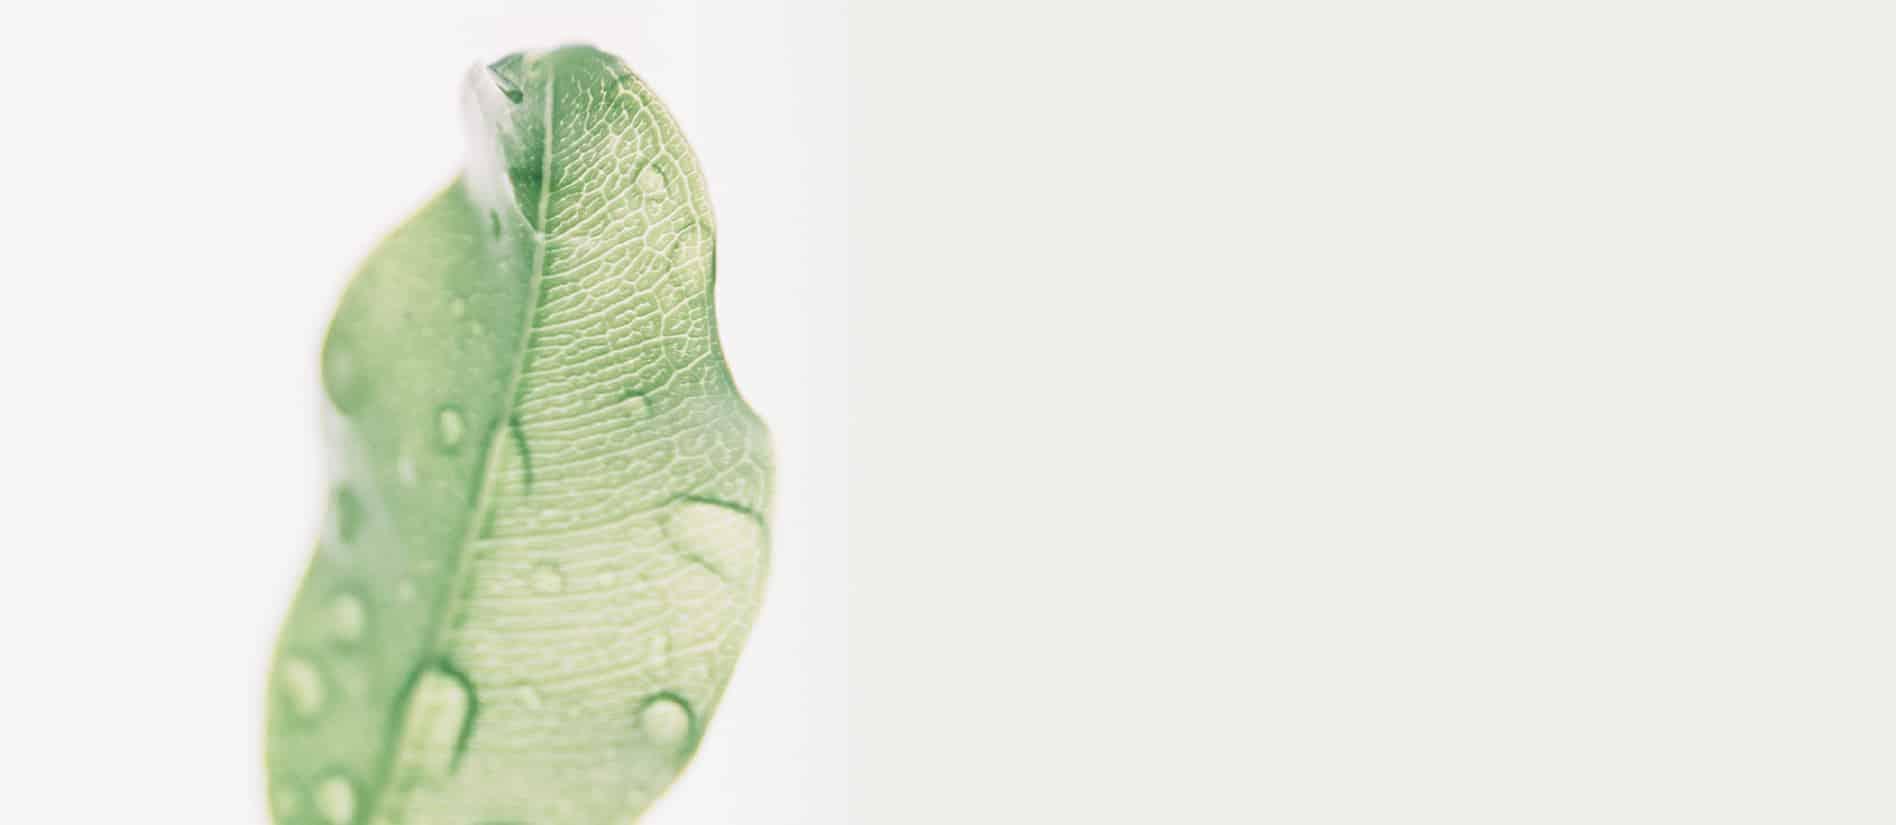 Ecosafe Green   Zero waste - leaf